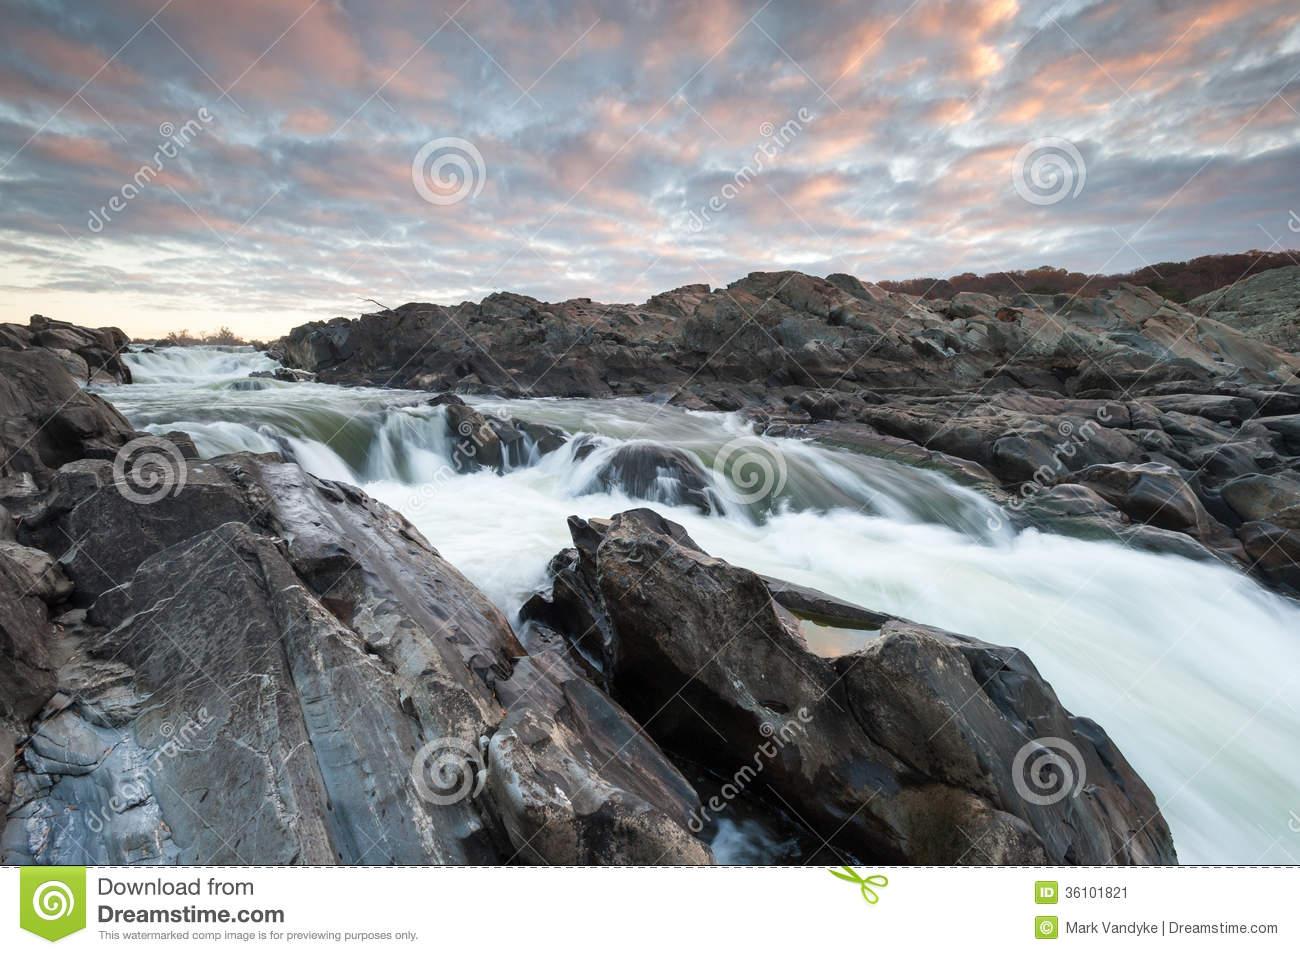 Great Falls Potomac River Waterfall Sunrise Scenic Stock Photo.